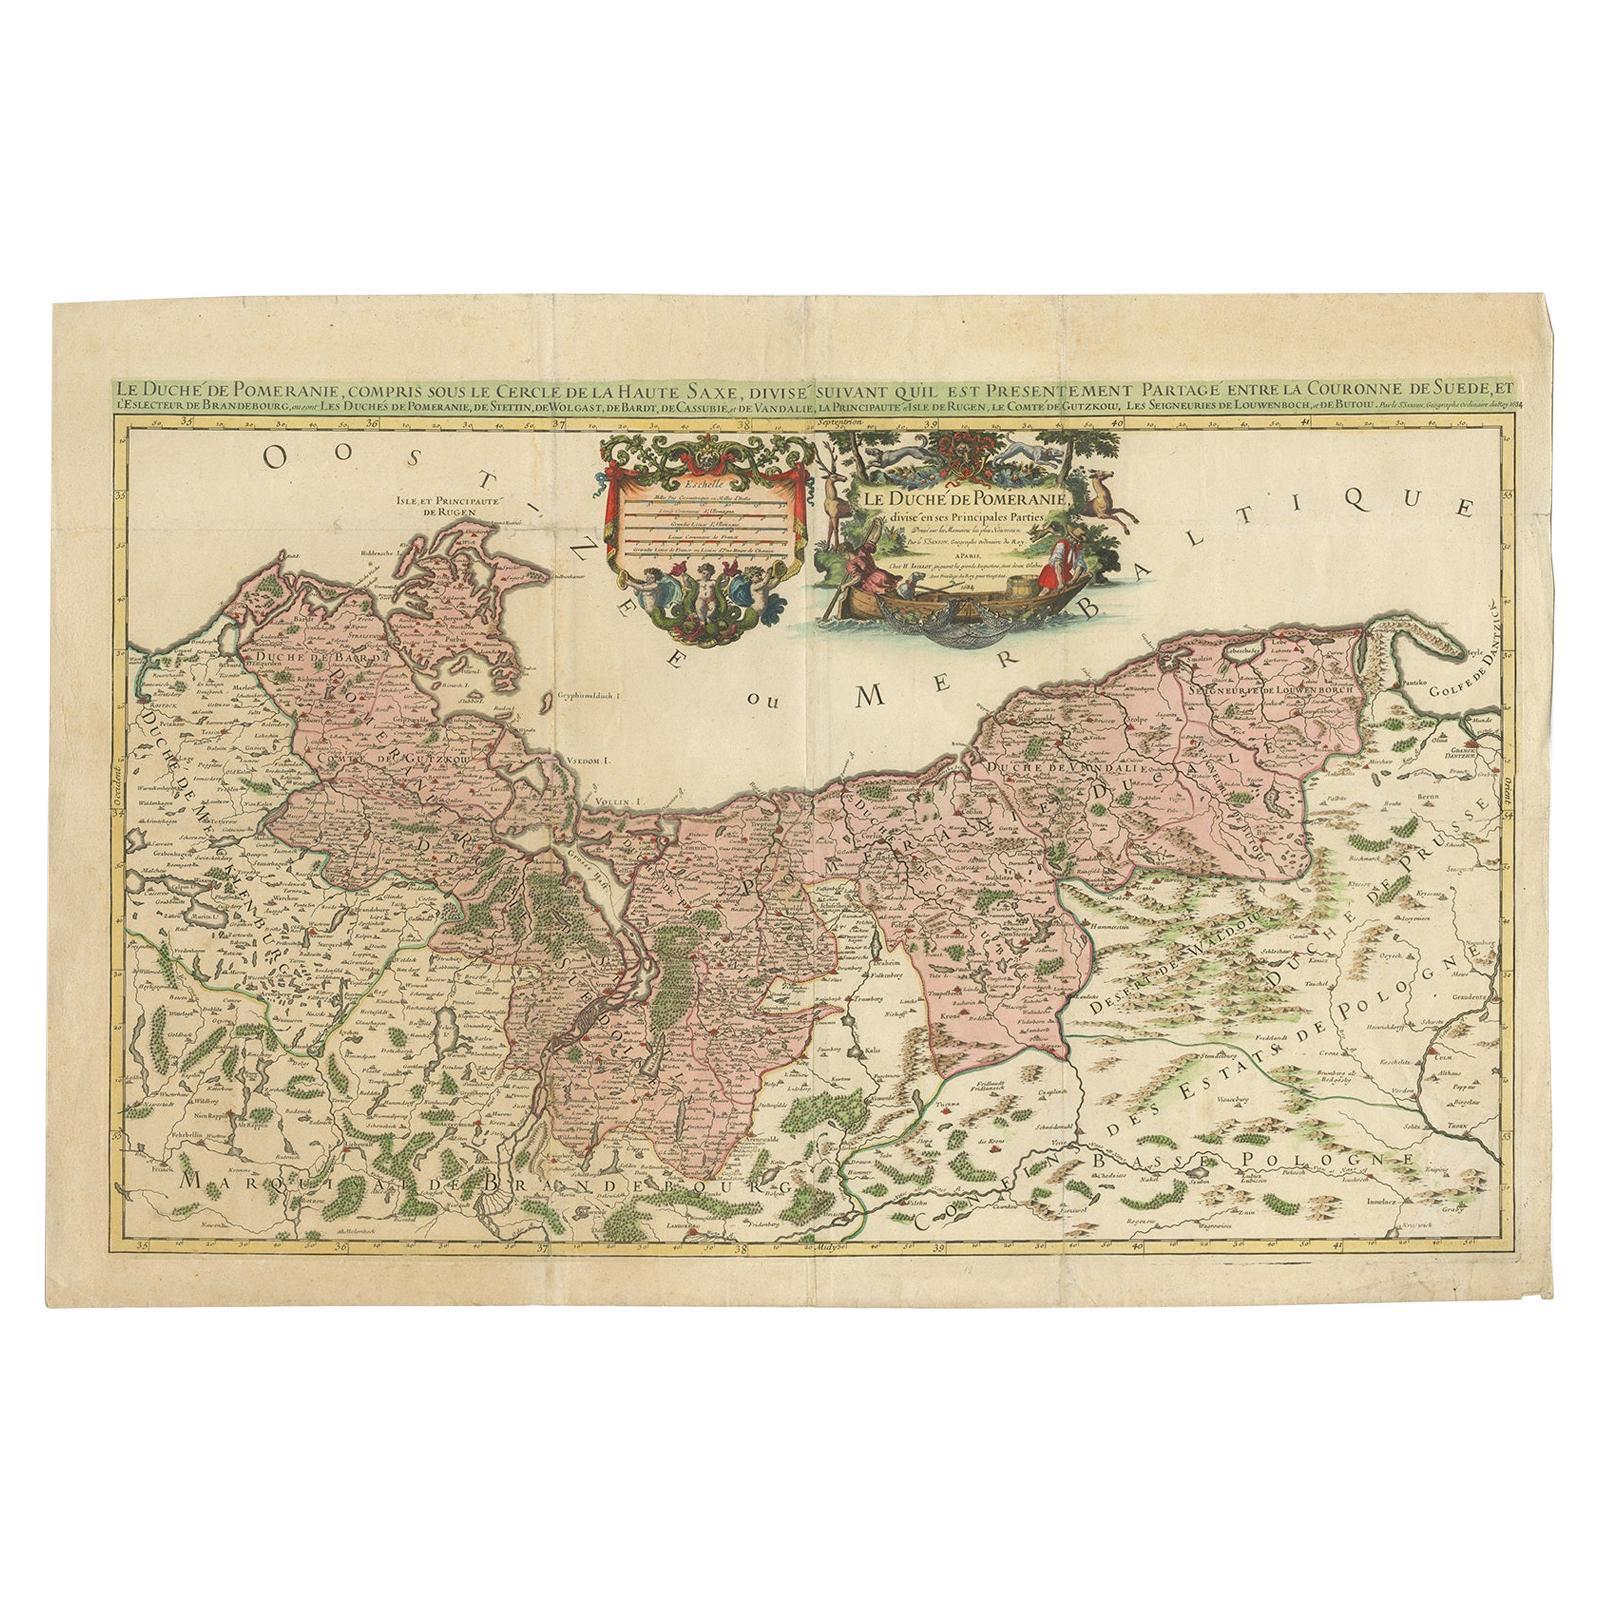 Antique Map of Pomerania by Sanson '1684'